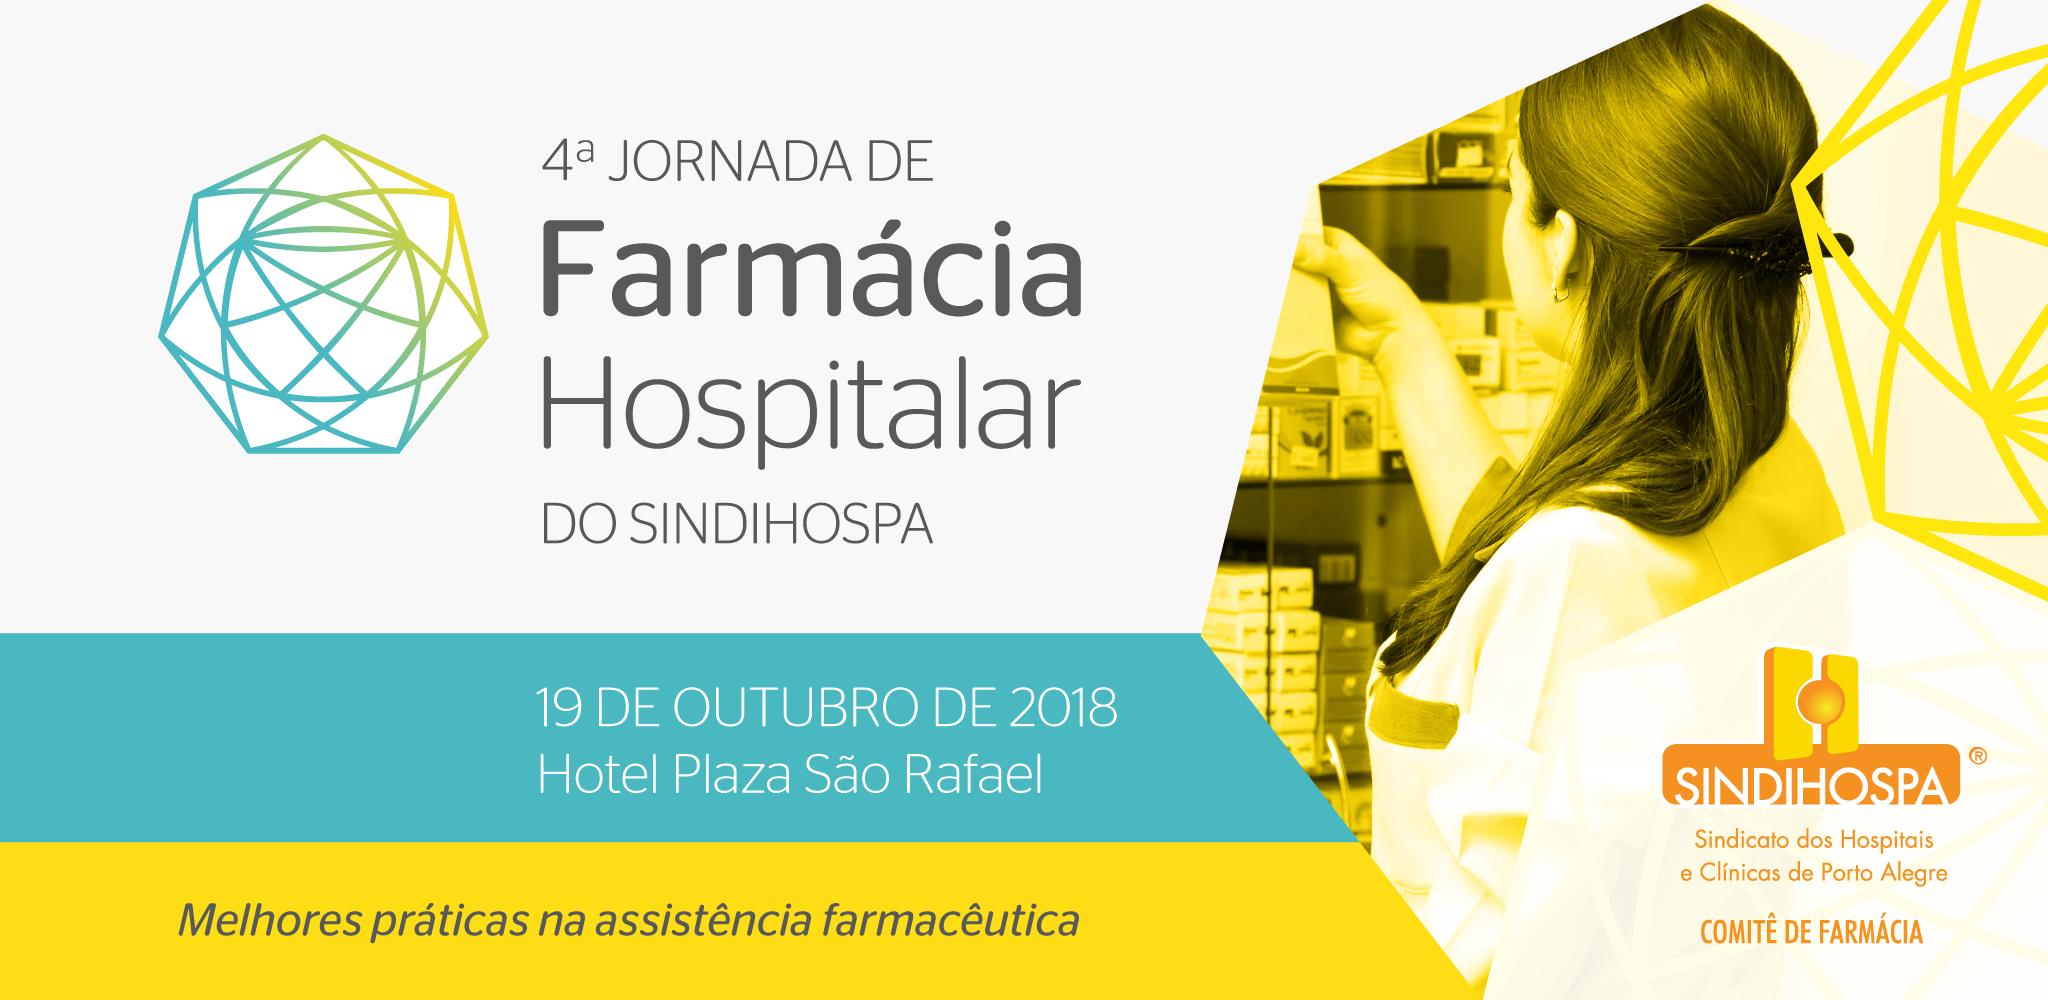 IV Jornada de Farmácia Hospitalar do SINDIHOSPA